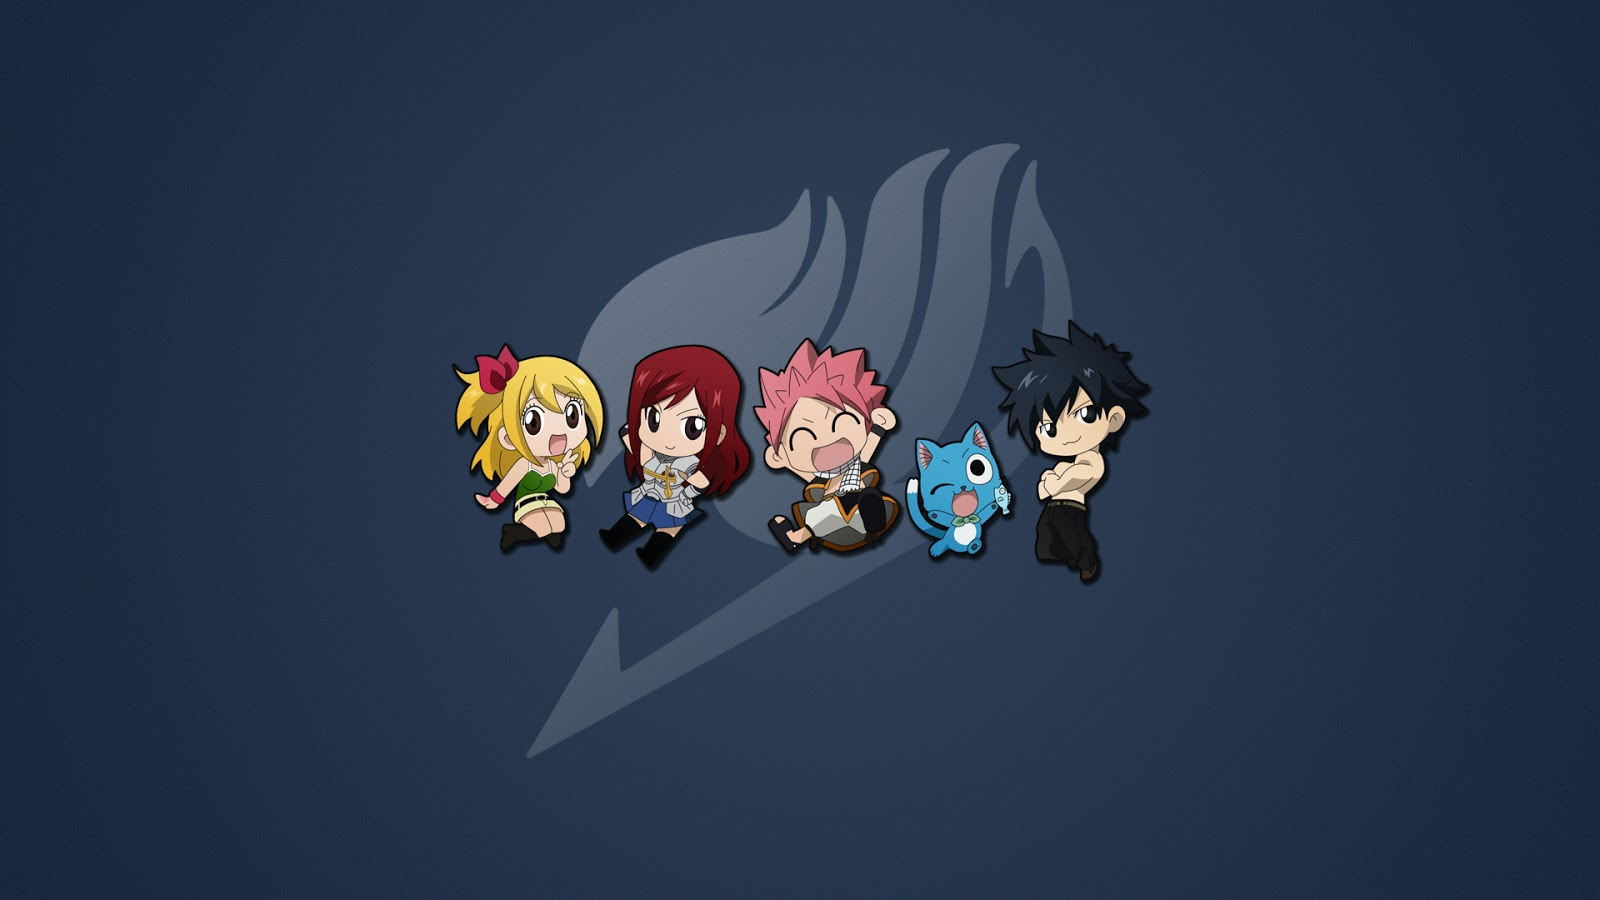 Fairy Tail Guild Logo Chibi Lucy Heartfilia Erza Scarlet Natsu 1600x900